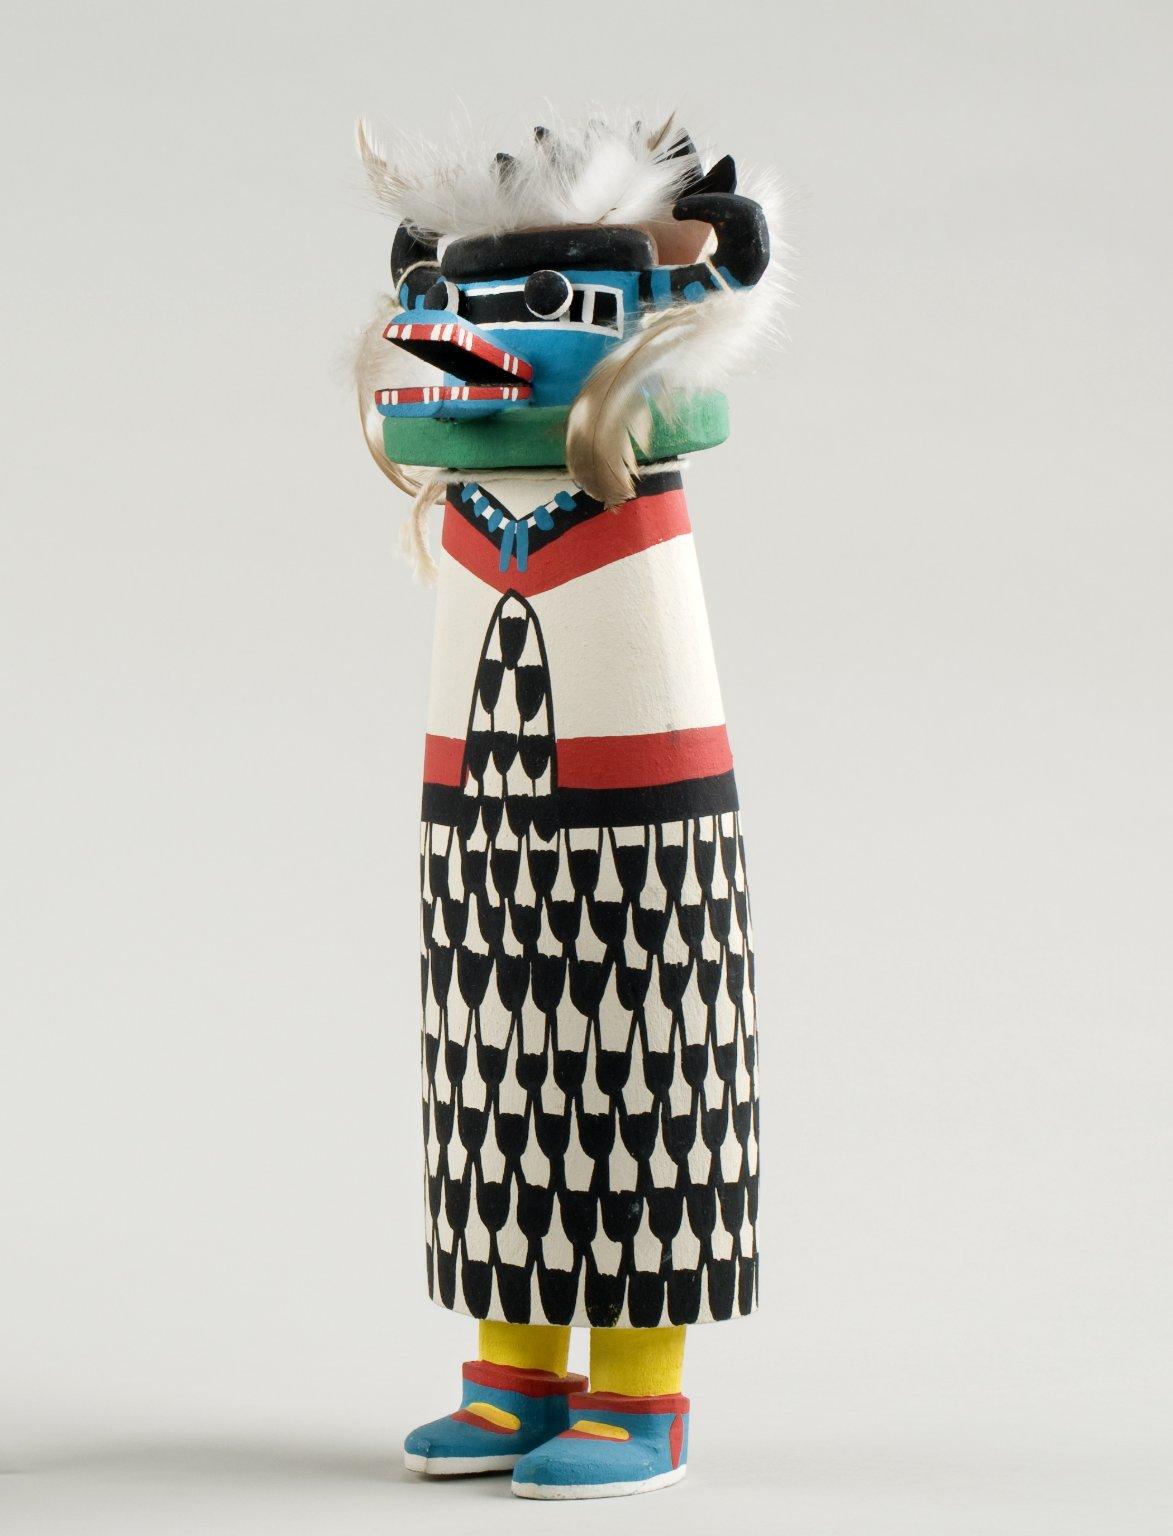 Sio Shalako Kachina Doll